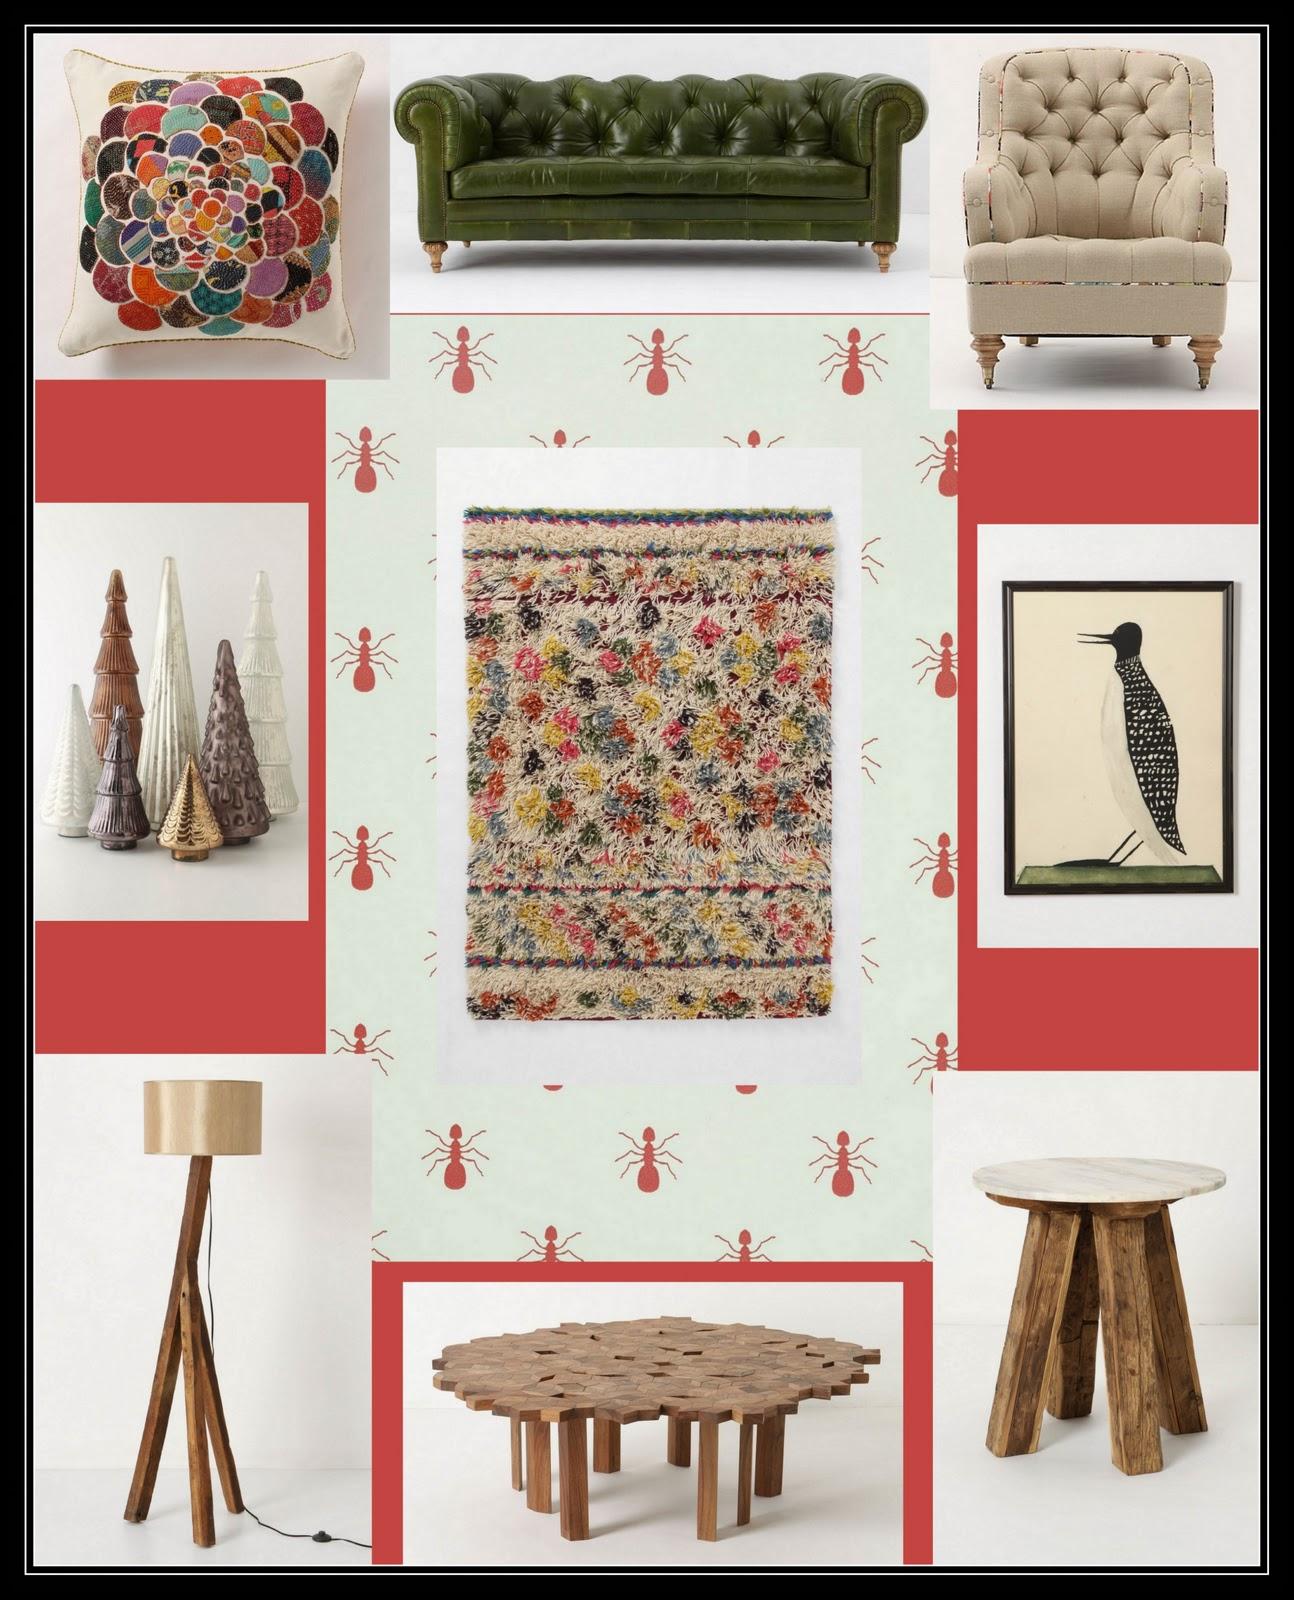 fabulous anthropologie inspired living room | GAFunkyFarmhouse: This 'n That Thursdays: An Anthropologie ...